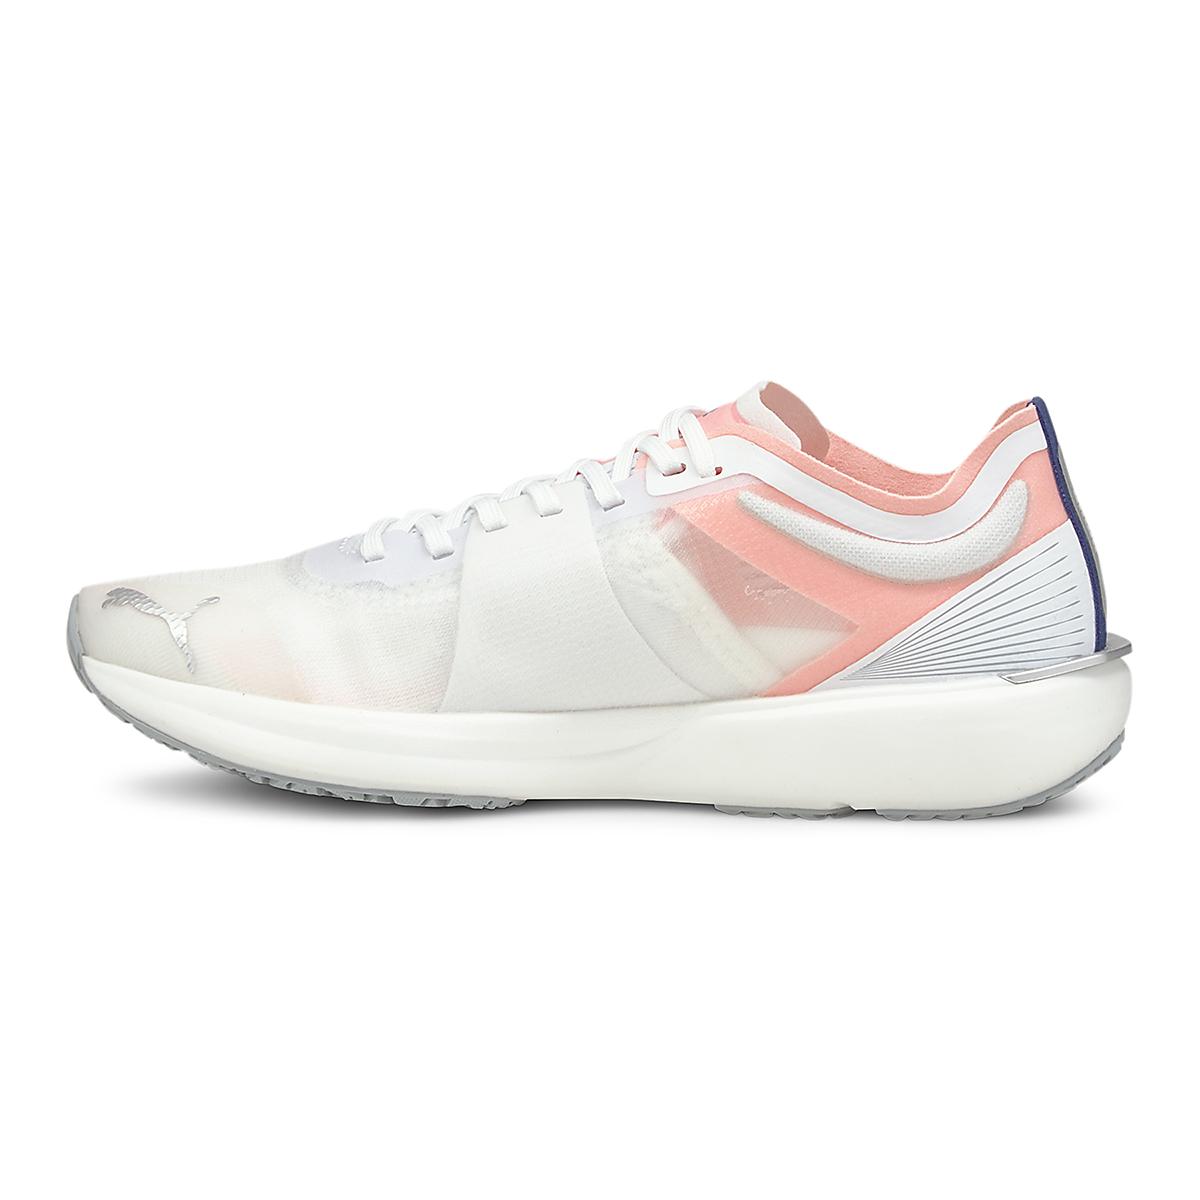 Women's Puma Liberate Nitro Running Shoe - Color: Puma White-Elektro Peach - Size: 6.5 - Width: Regular, Puma White-Elektro Peach, large, image 2